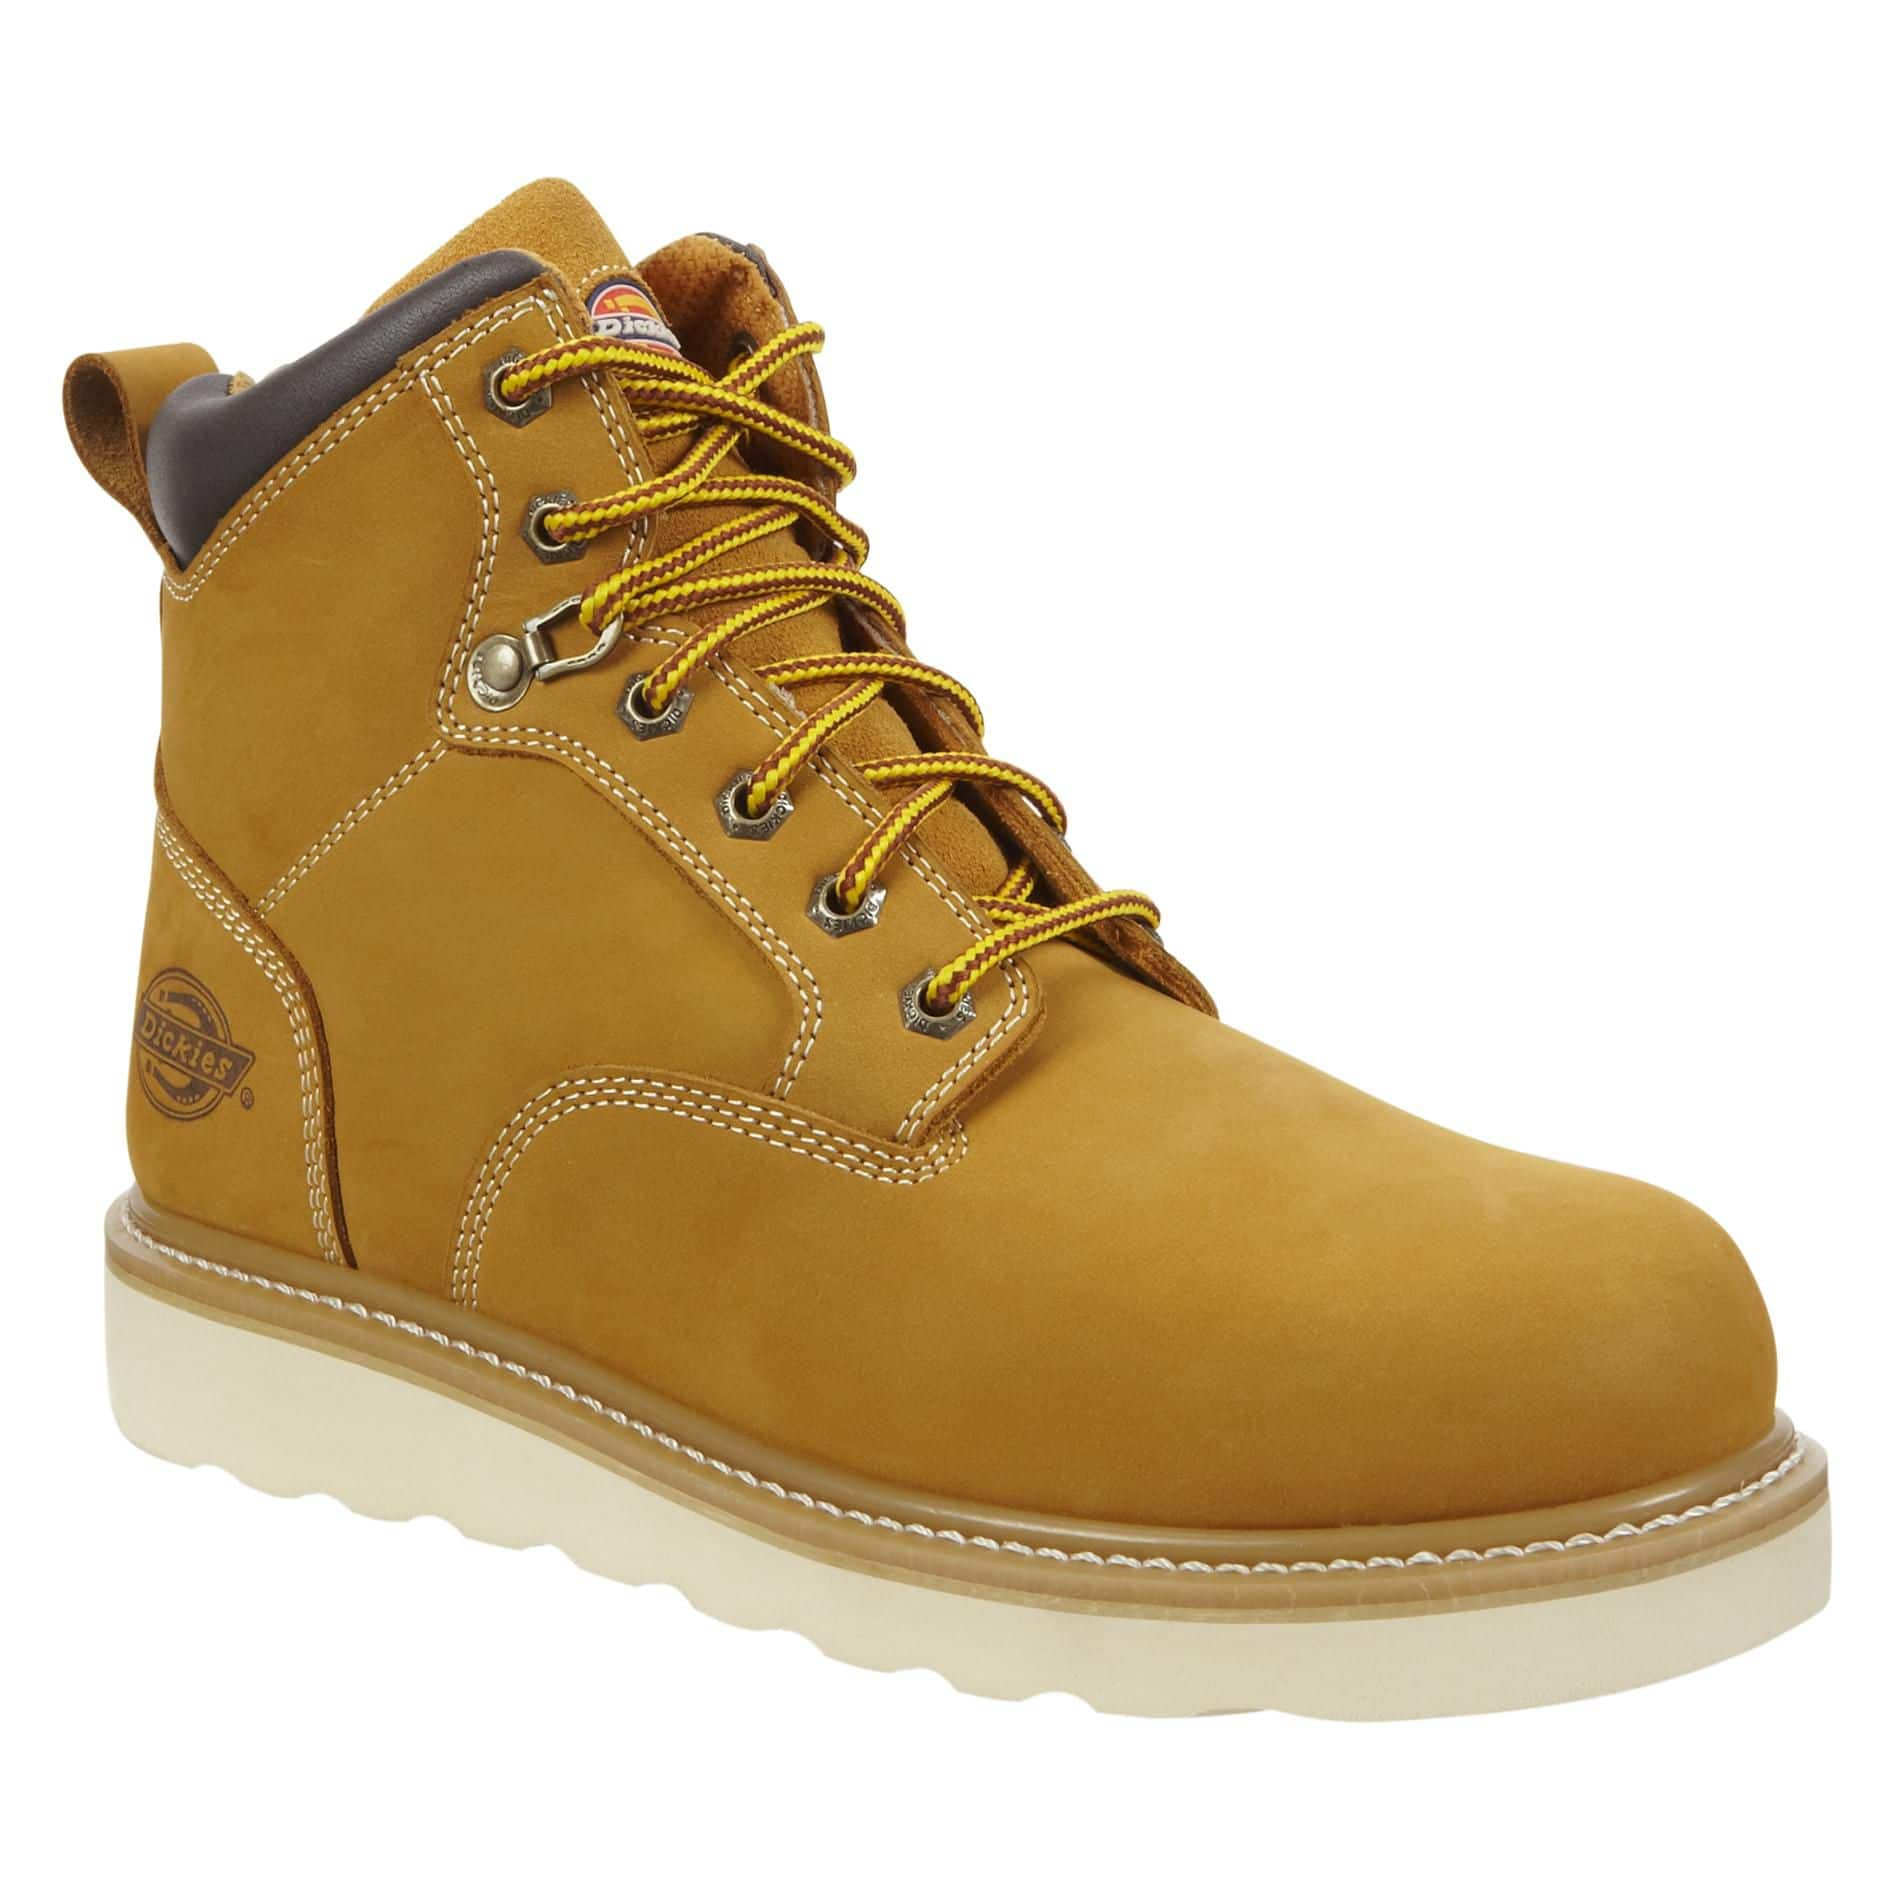 Sears: Men's Dickies Bearcat Work Boot $46.74, Craftsman AirFrame Waterproof Boot $73  + Free Store Pickup & More